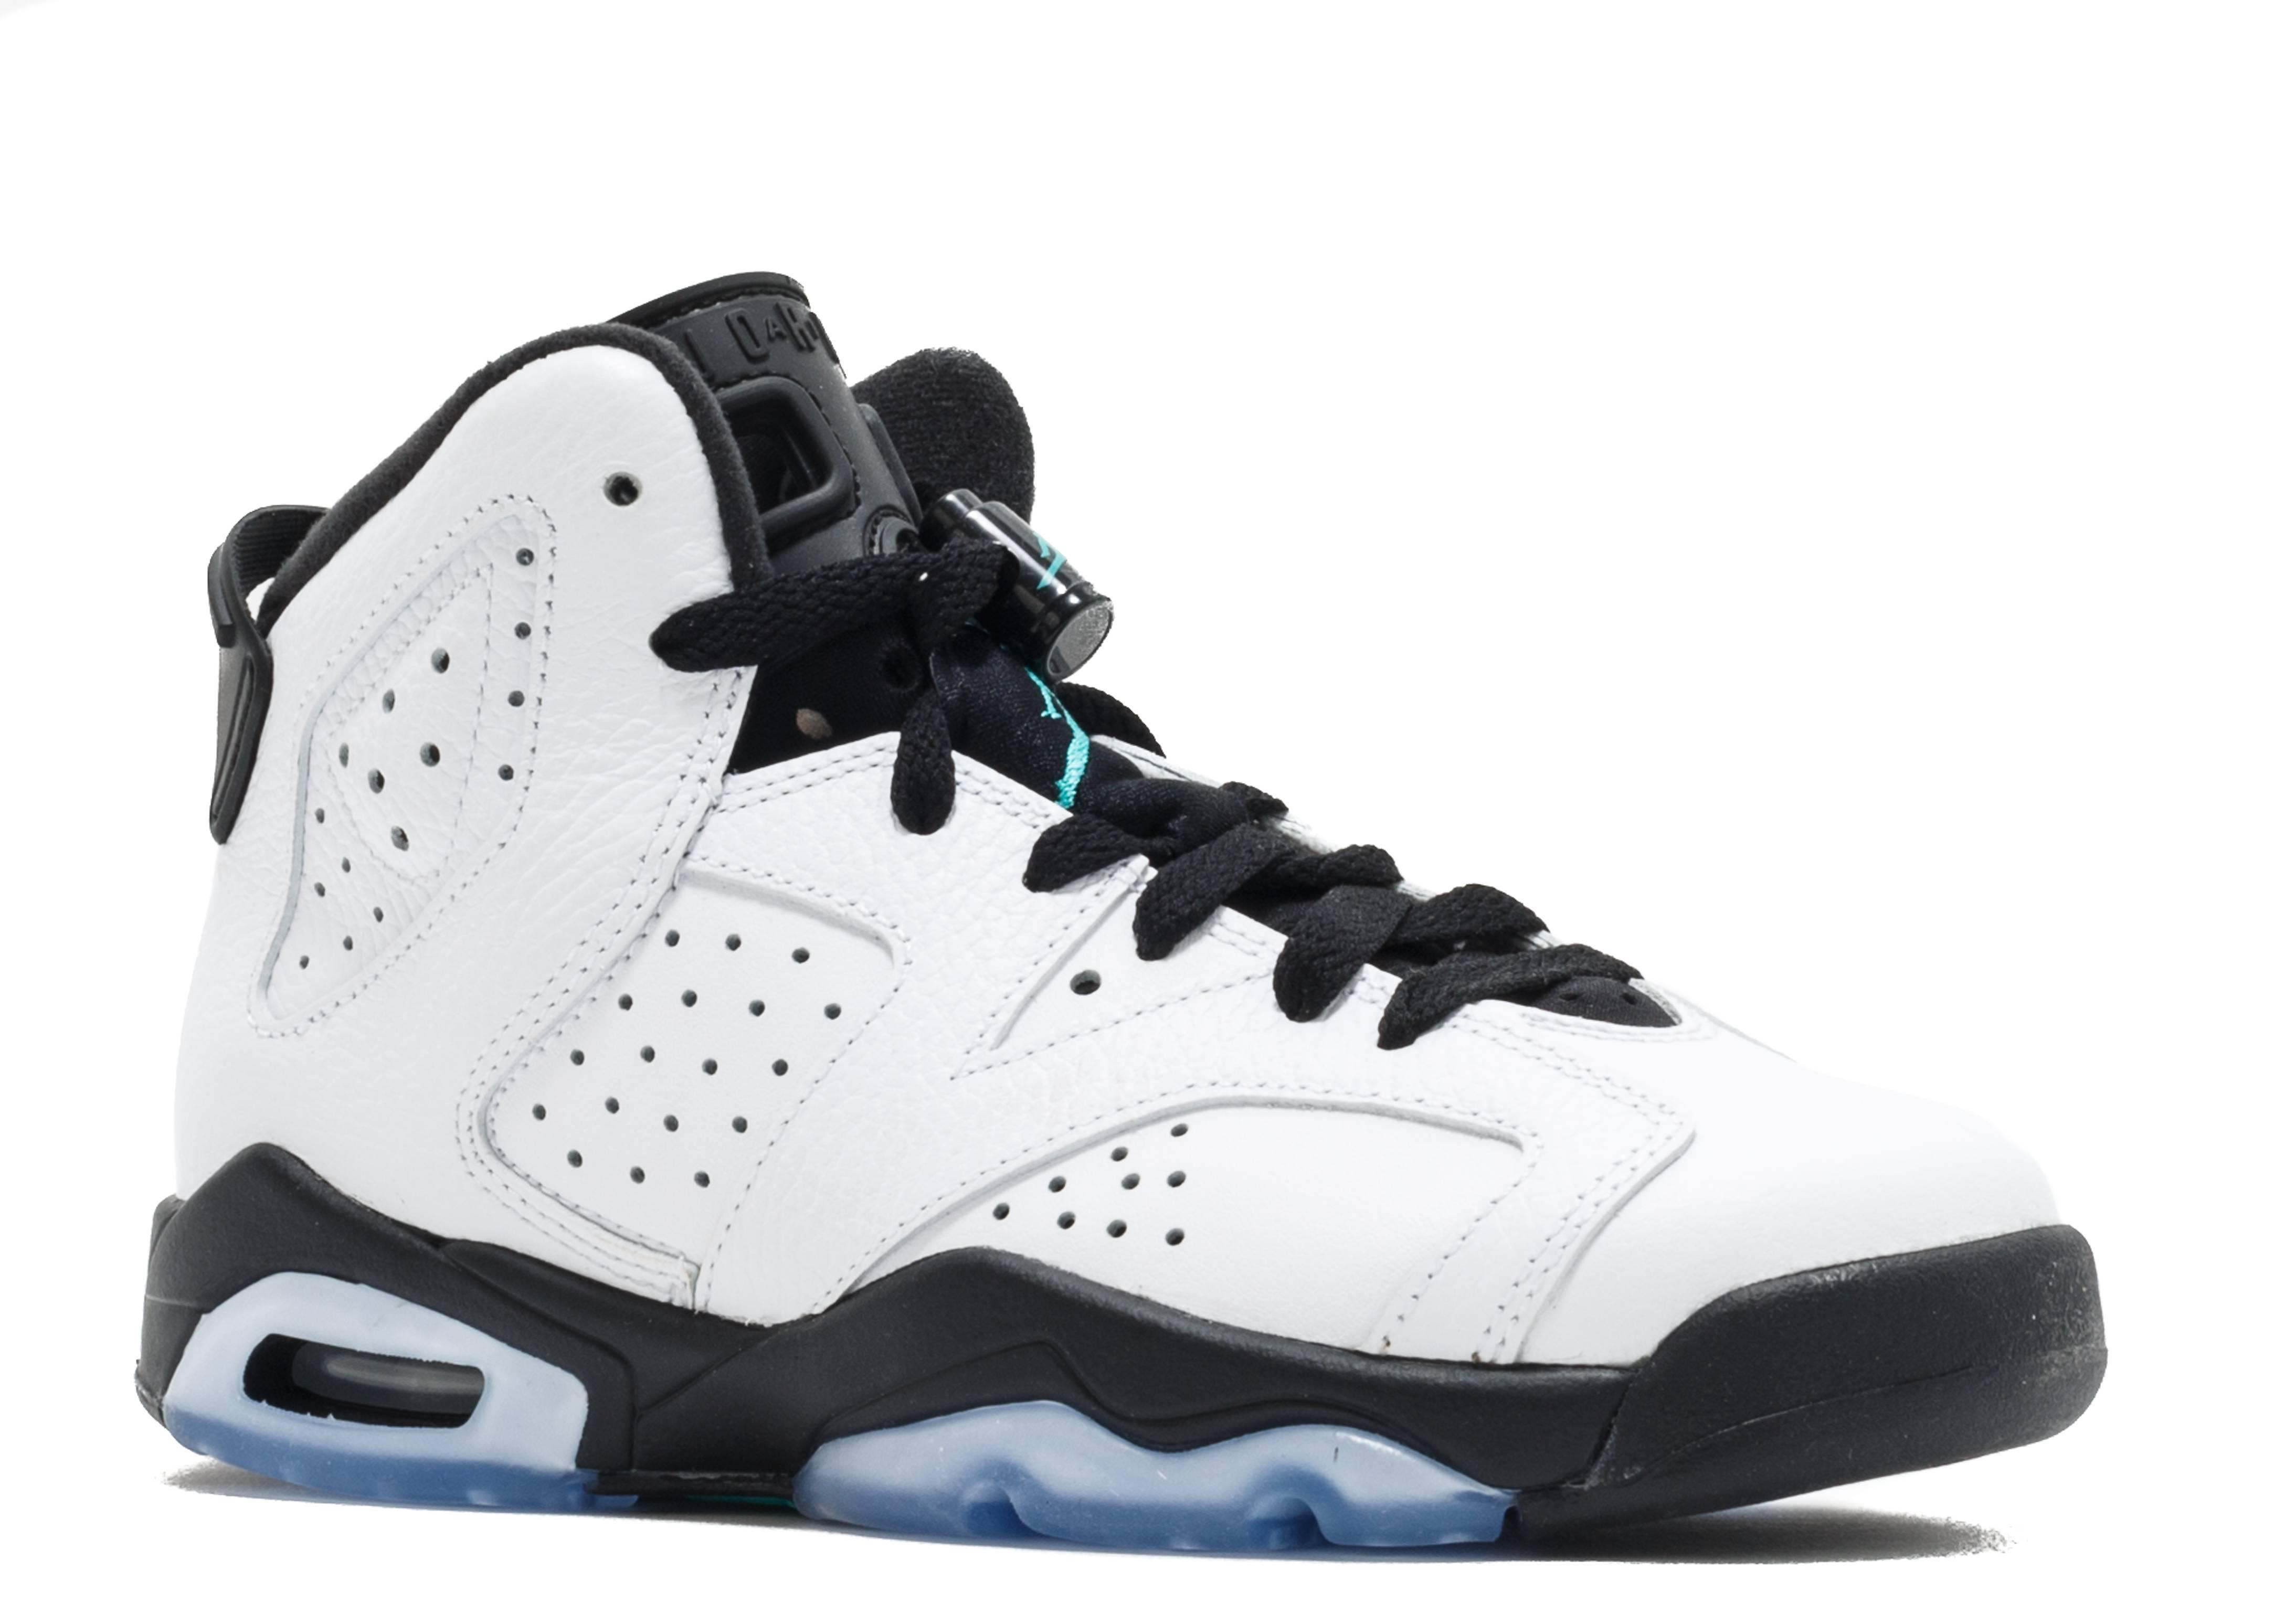 Jordan 6 Hyper Jade Sizes  9150cfb24